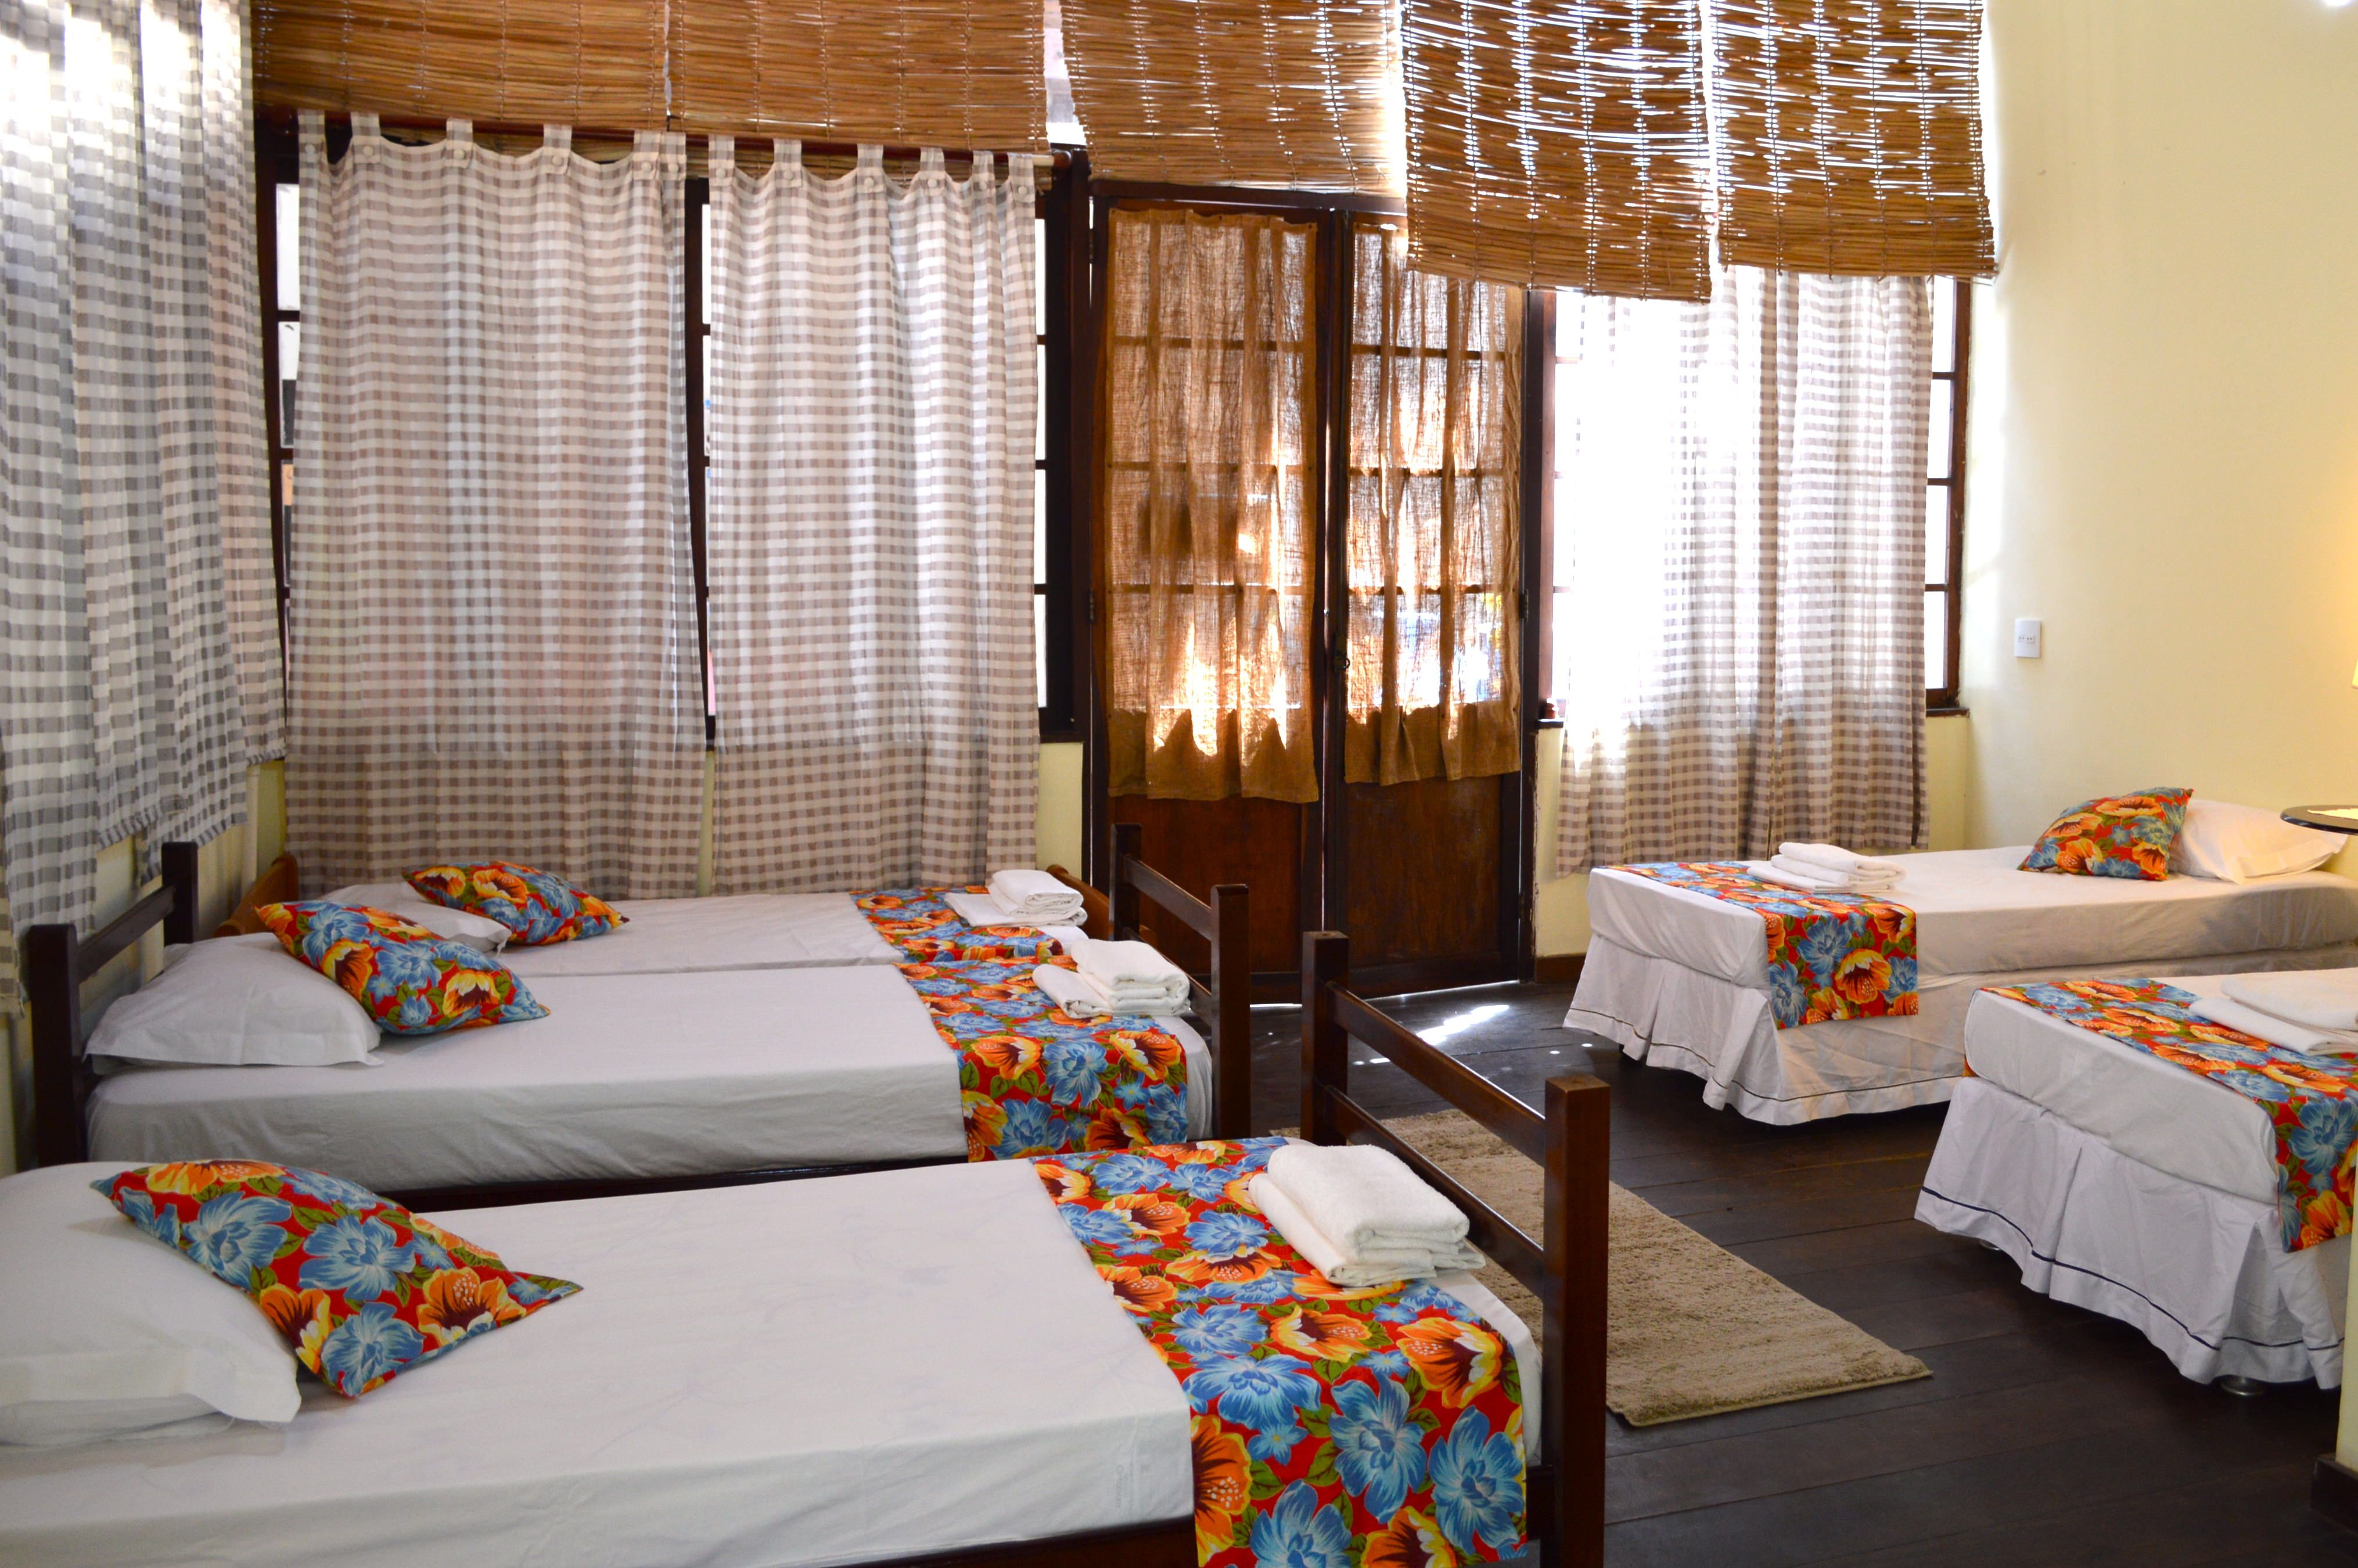 Pixinguinha room - Alma de Santa Guest House - Rio de Janeiro - Brazil